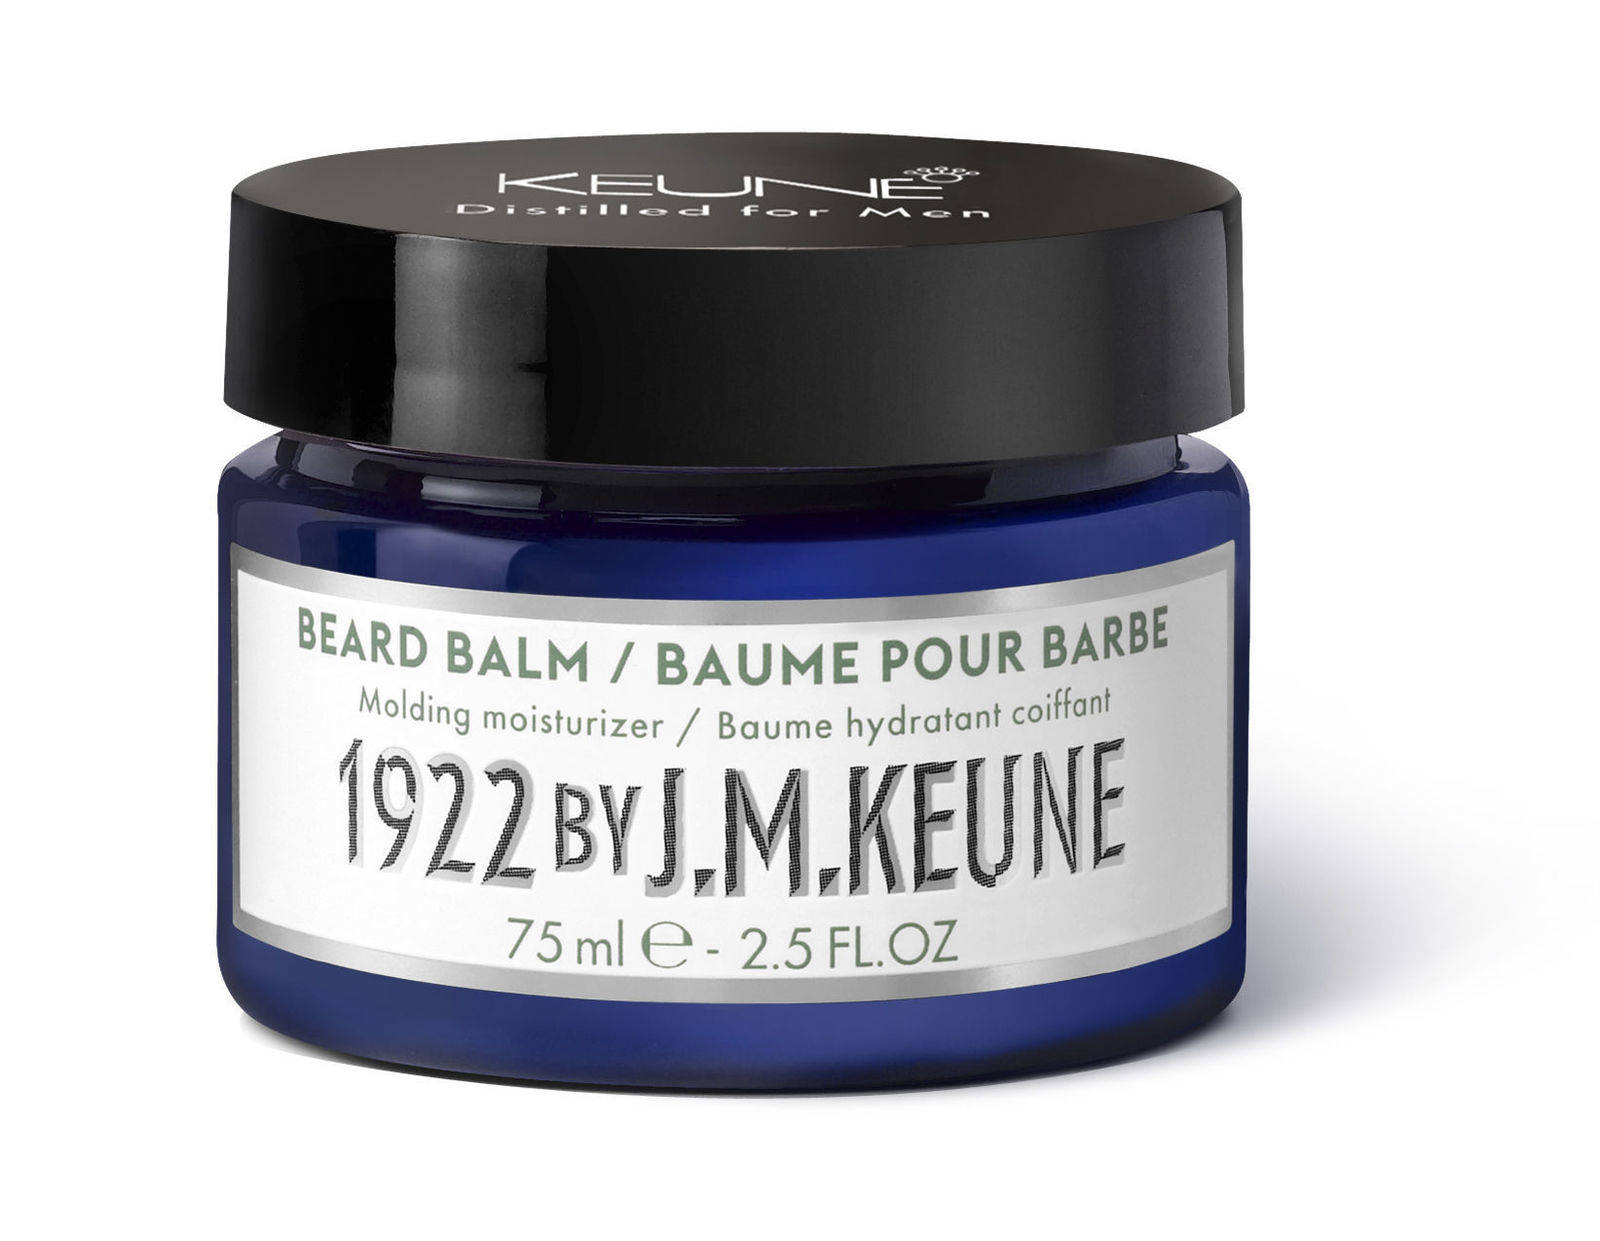 BAUME POUR BARBE 75 ml - 1922 BY J.M. KEUNE